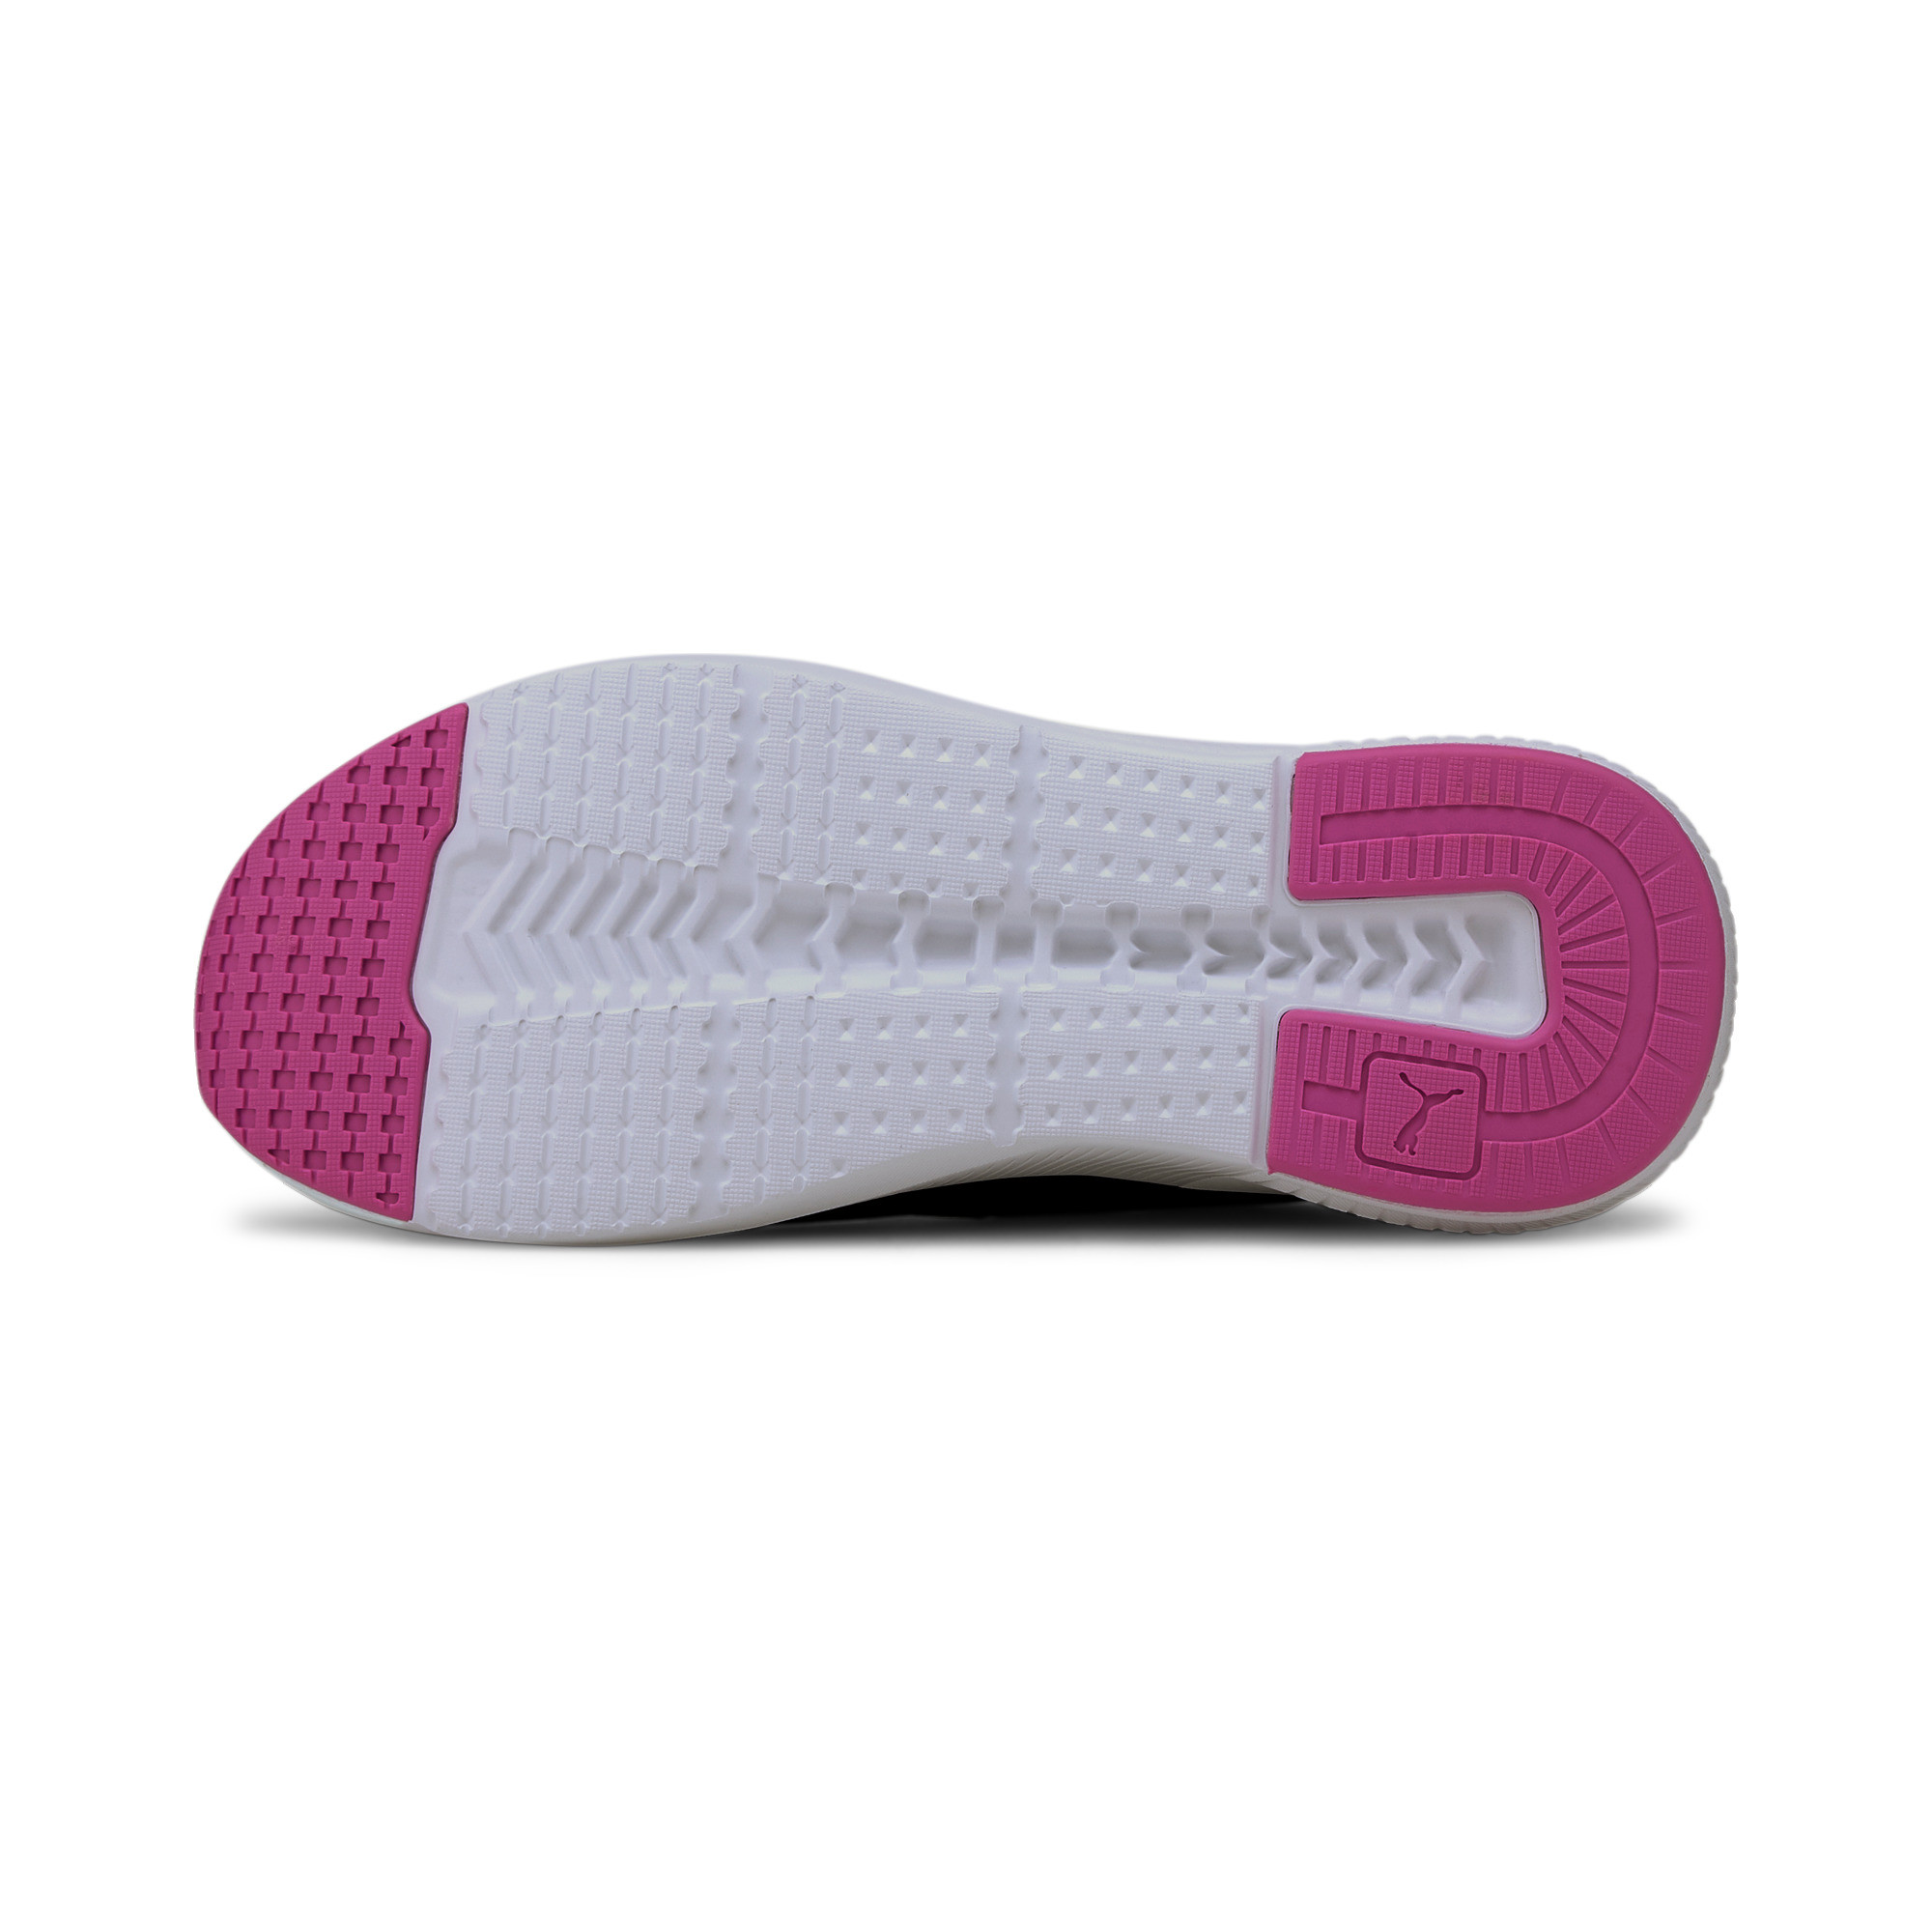 thumbnail 6 - PUMA-Women-039-s-Platinum-Training-Shoes